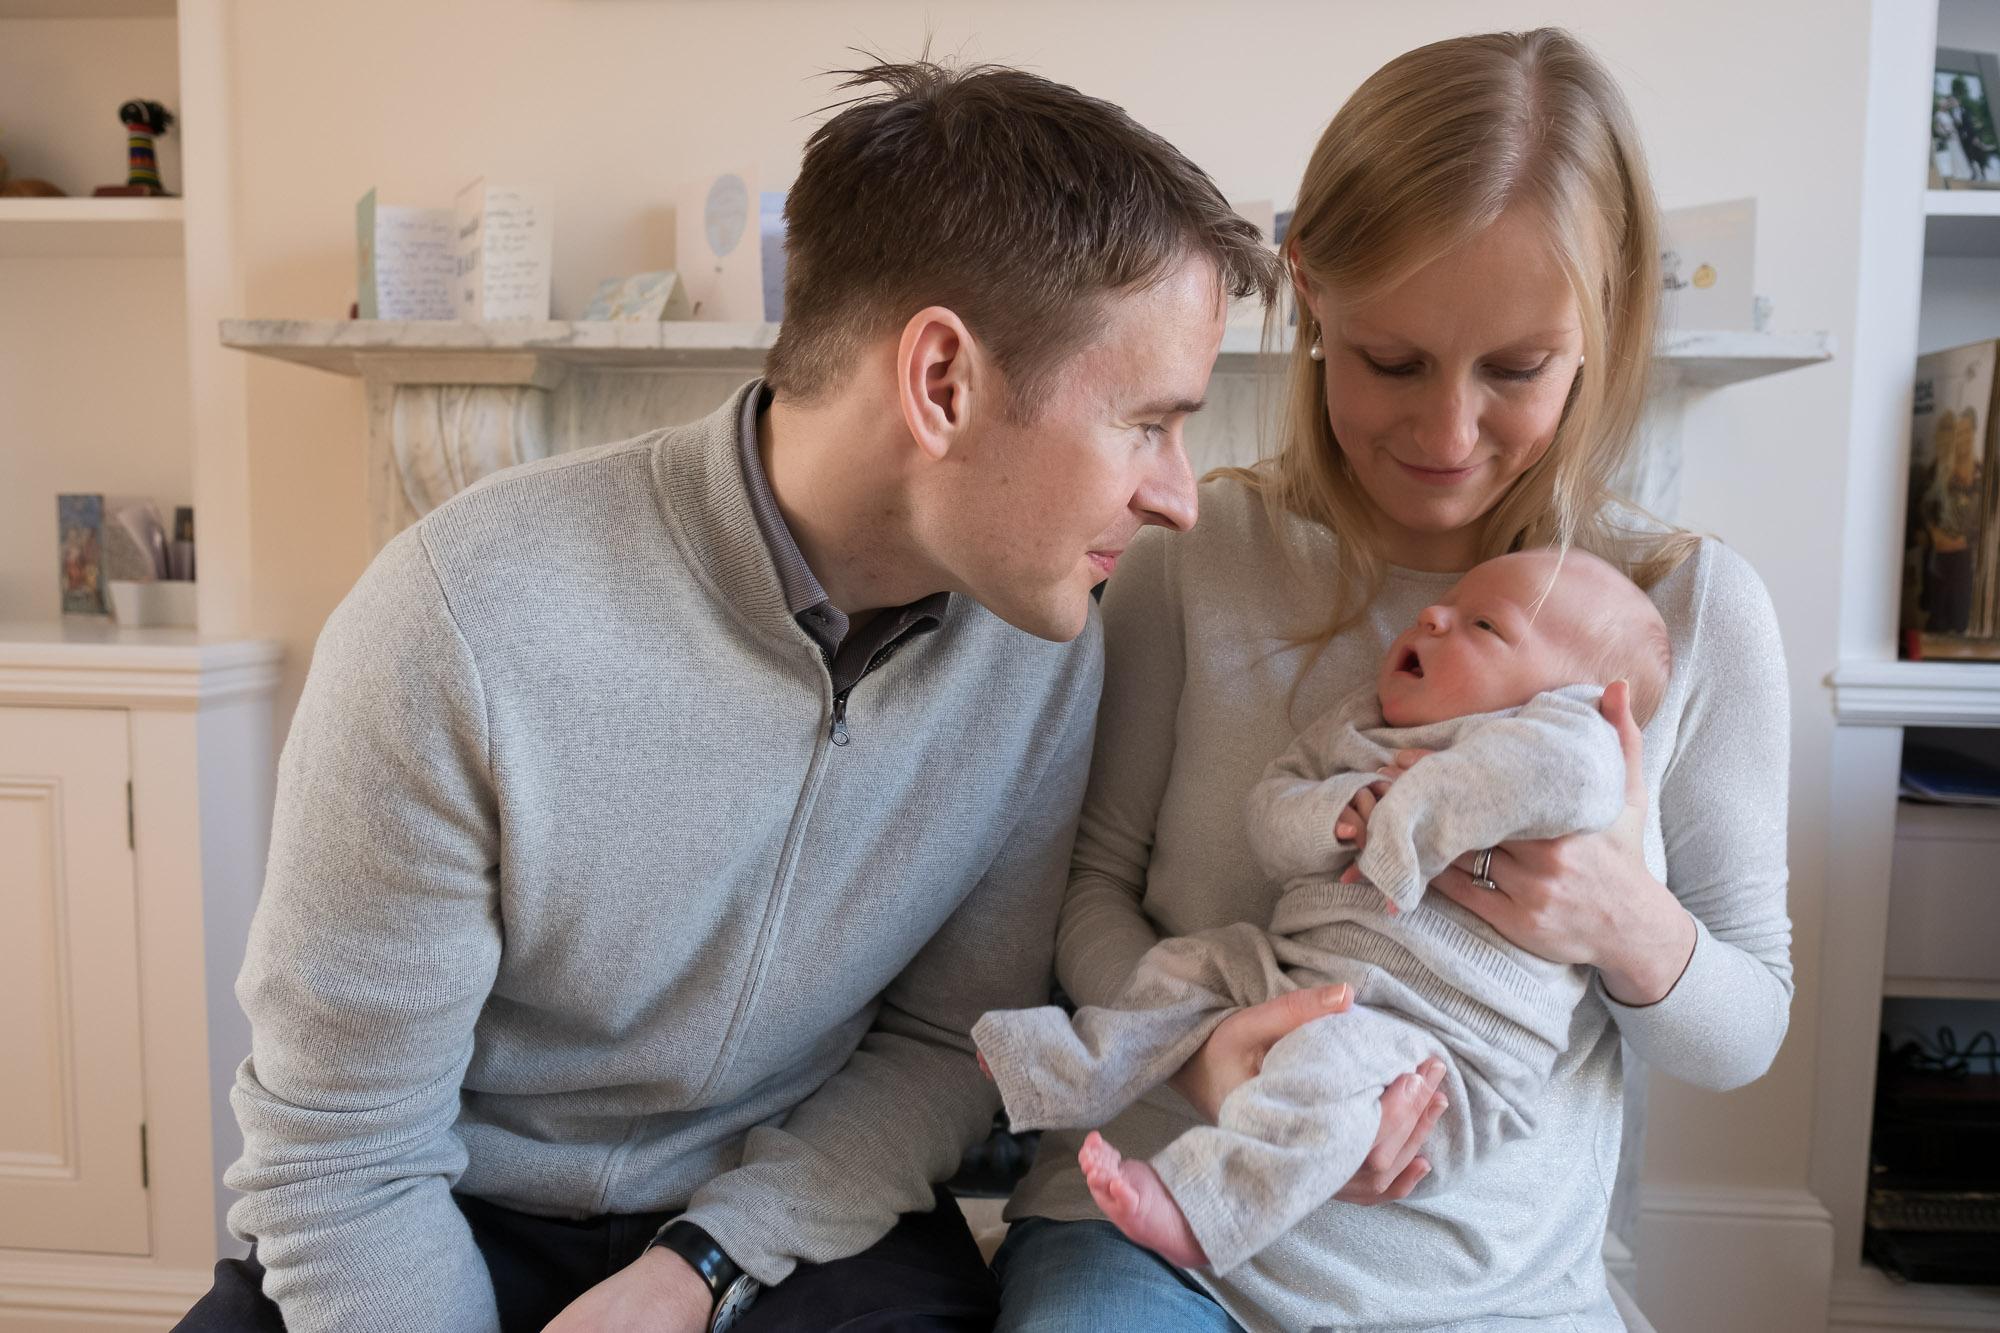 family-portrait-baby-photographer-052.jpg